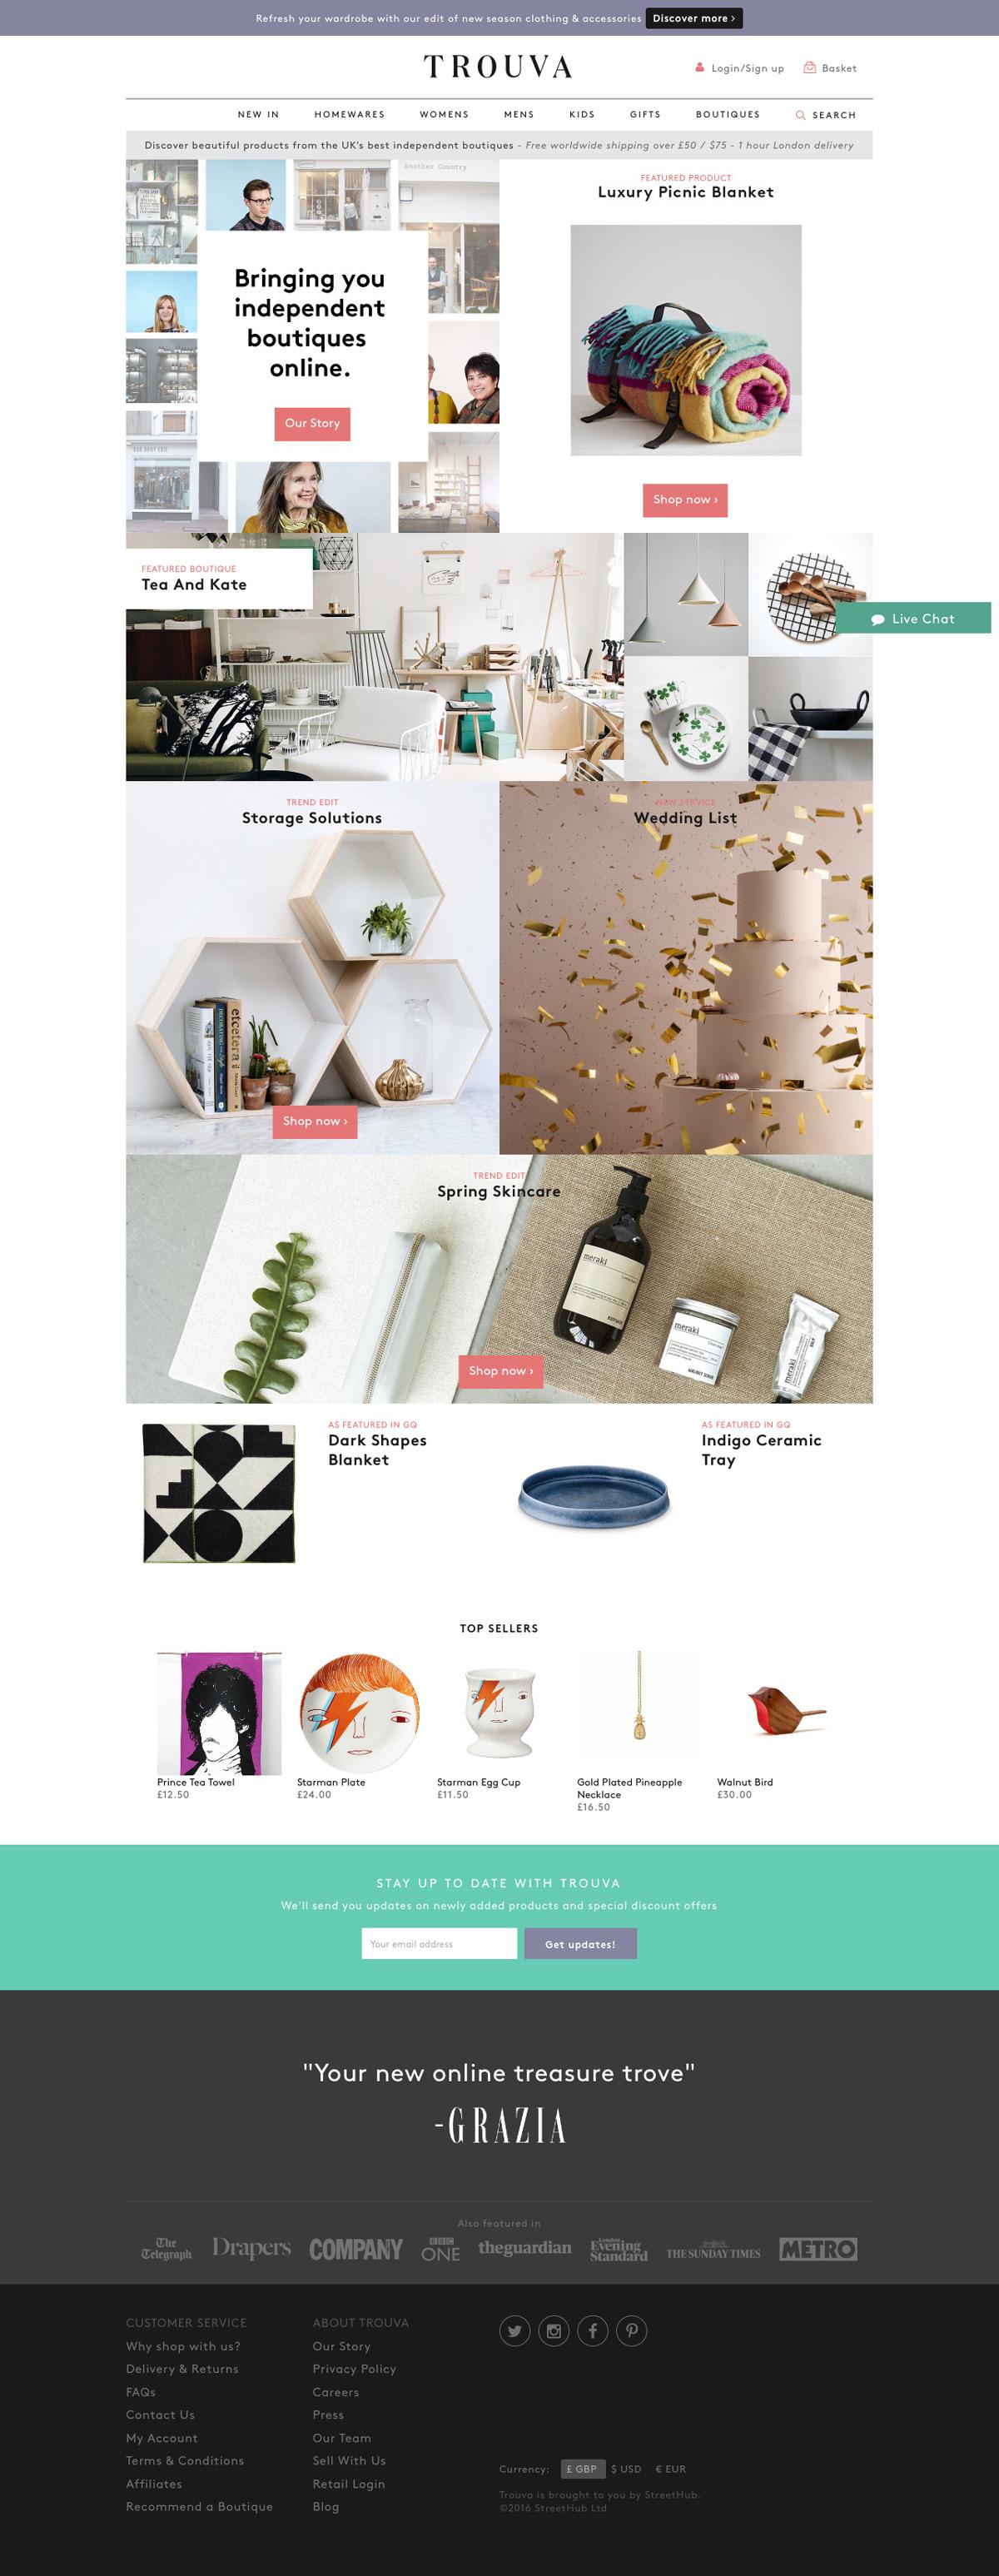 eCommerce website: Trouva